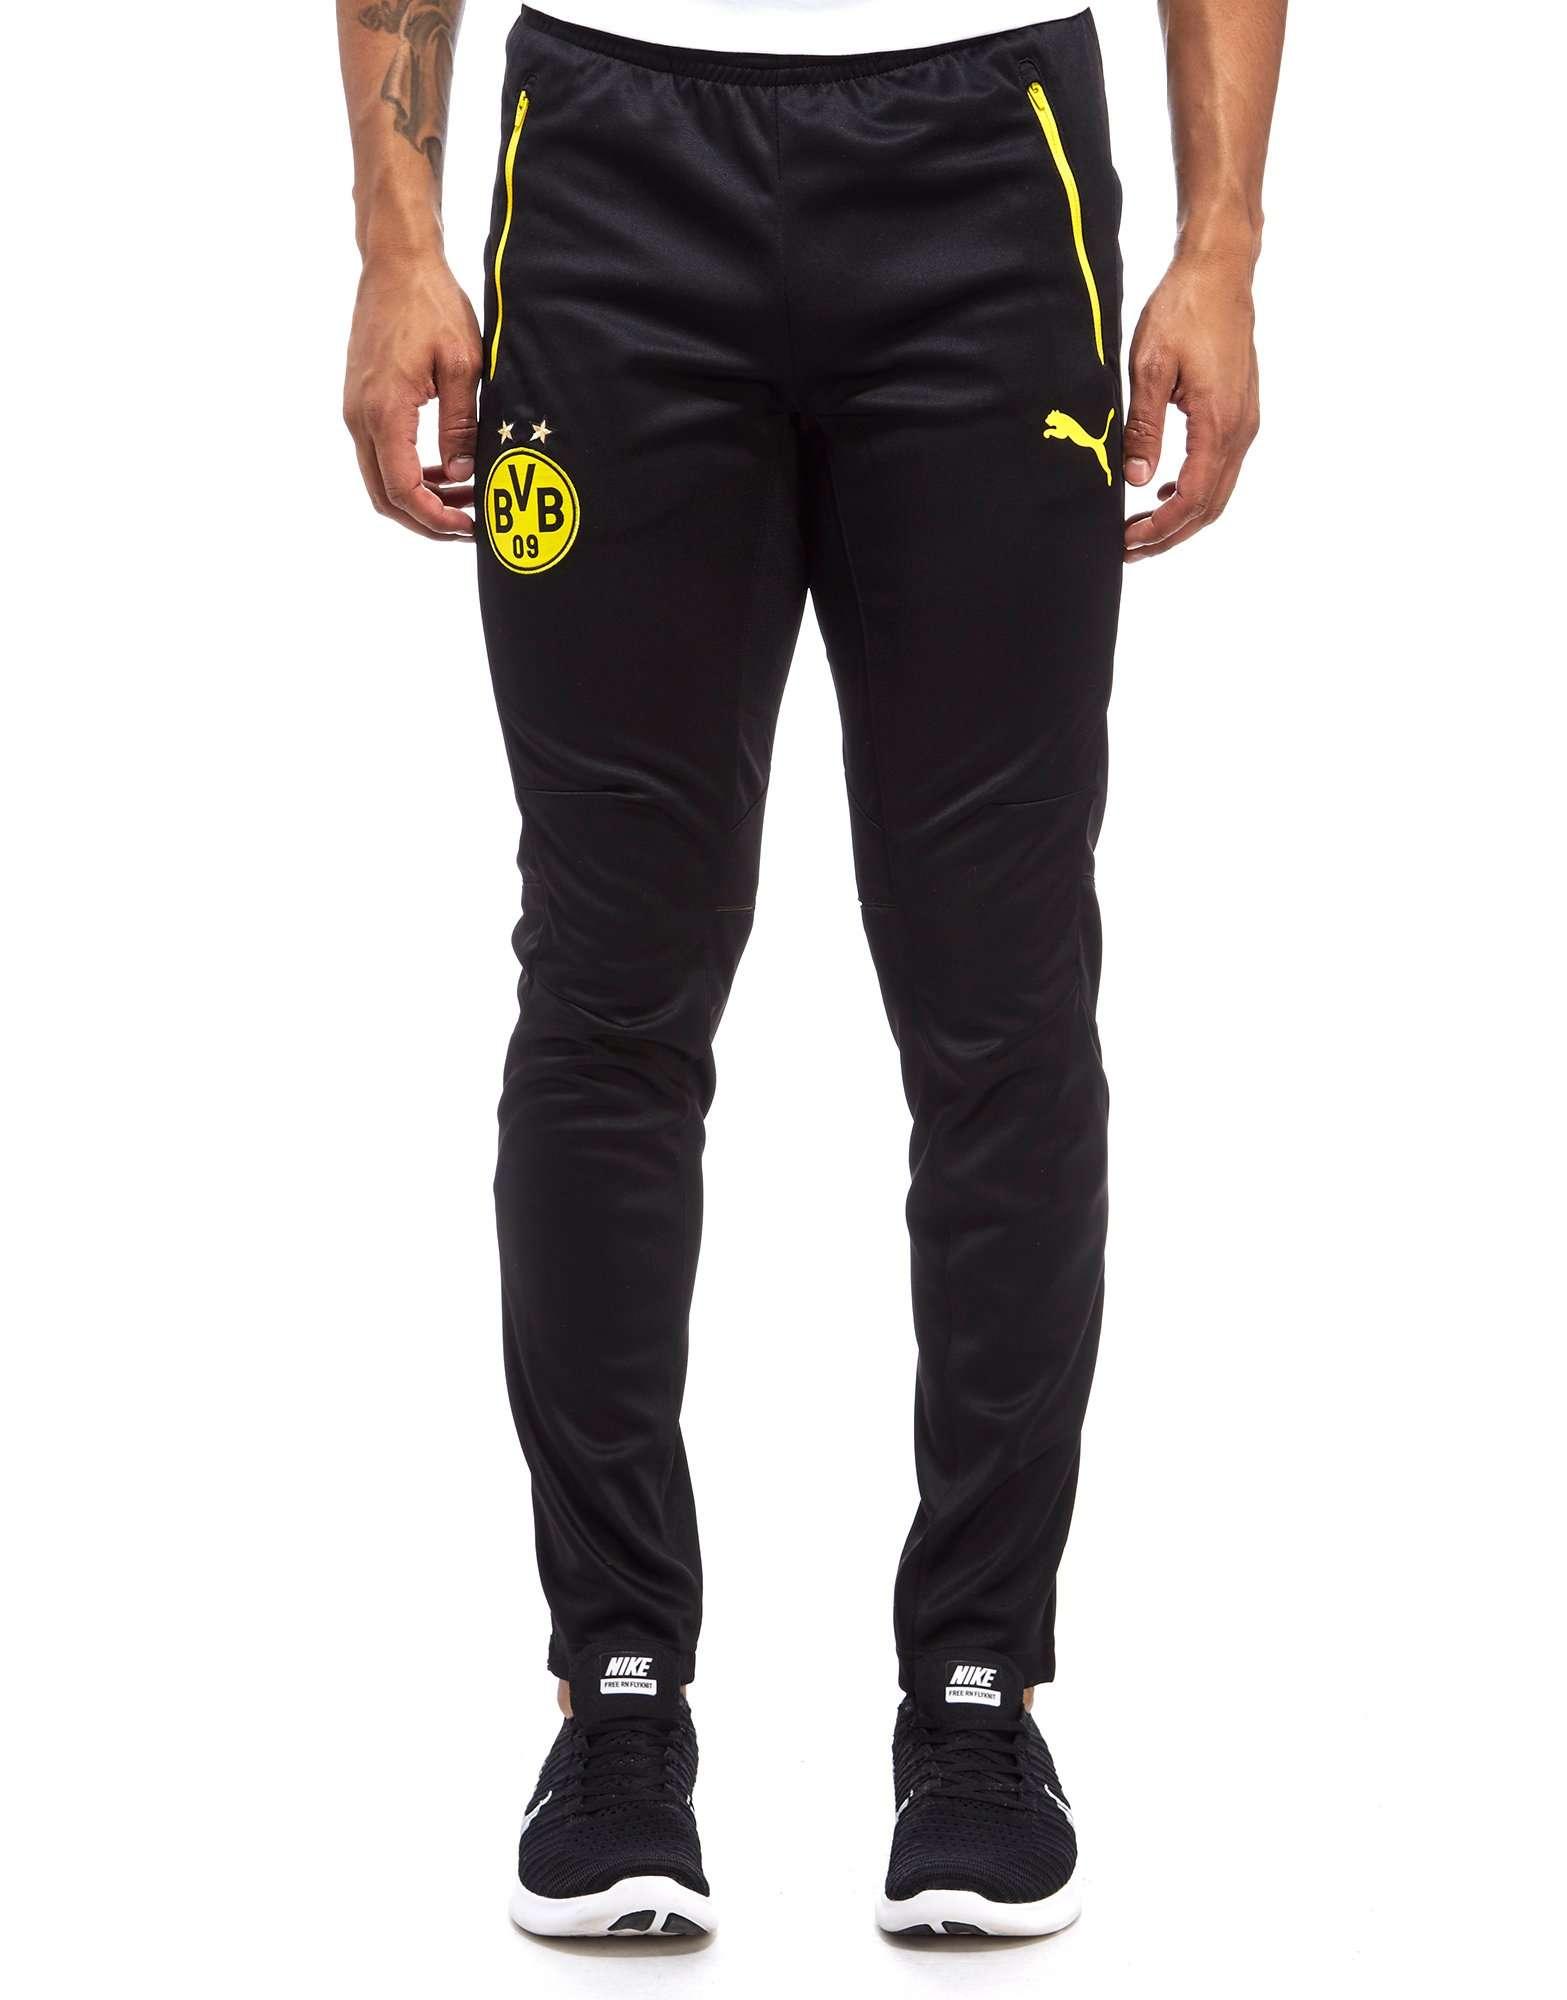 PUMA Borussia Dortmund 2017 Training Pants